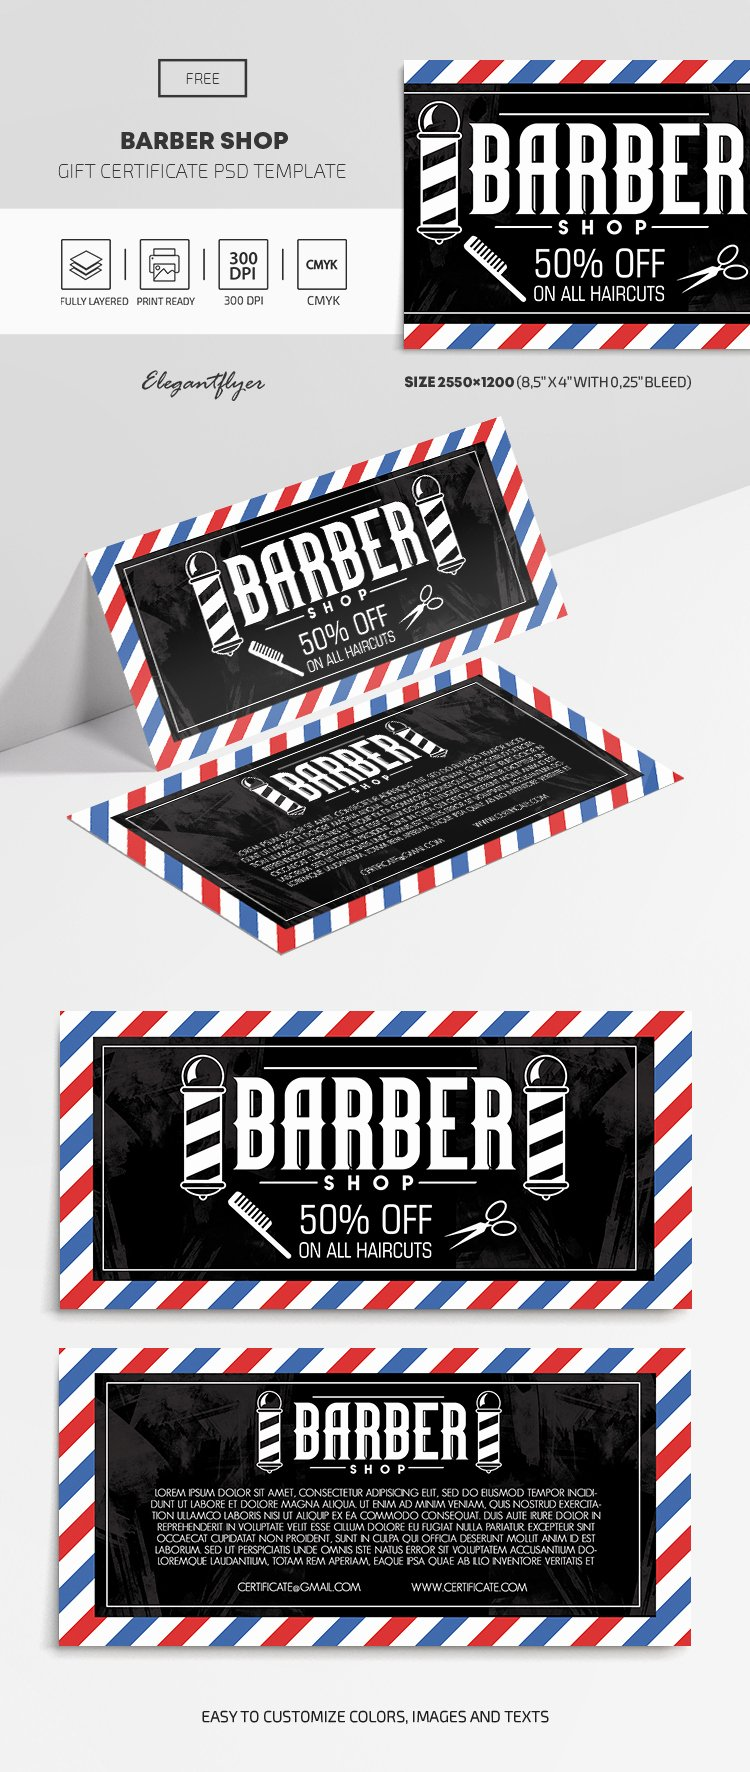 Barber Shop Gift Certificate Template Elegant Barber Shop Gift Certificate Template